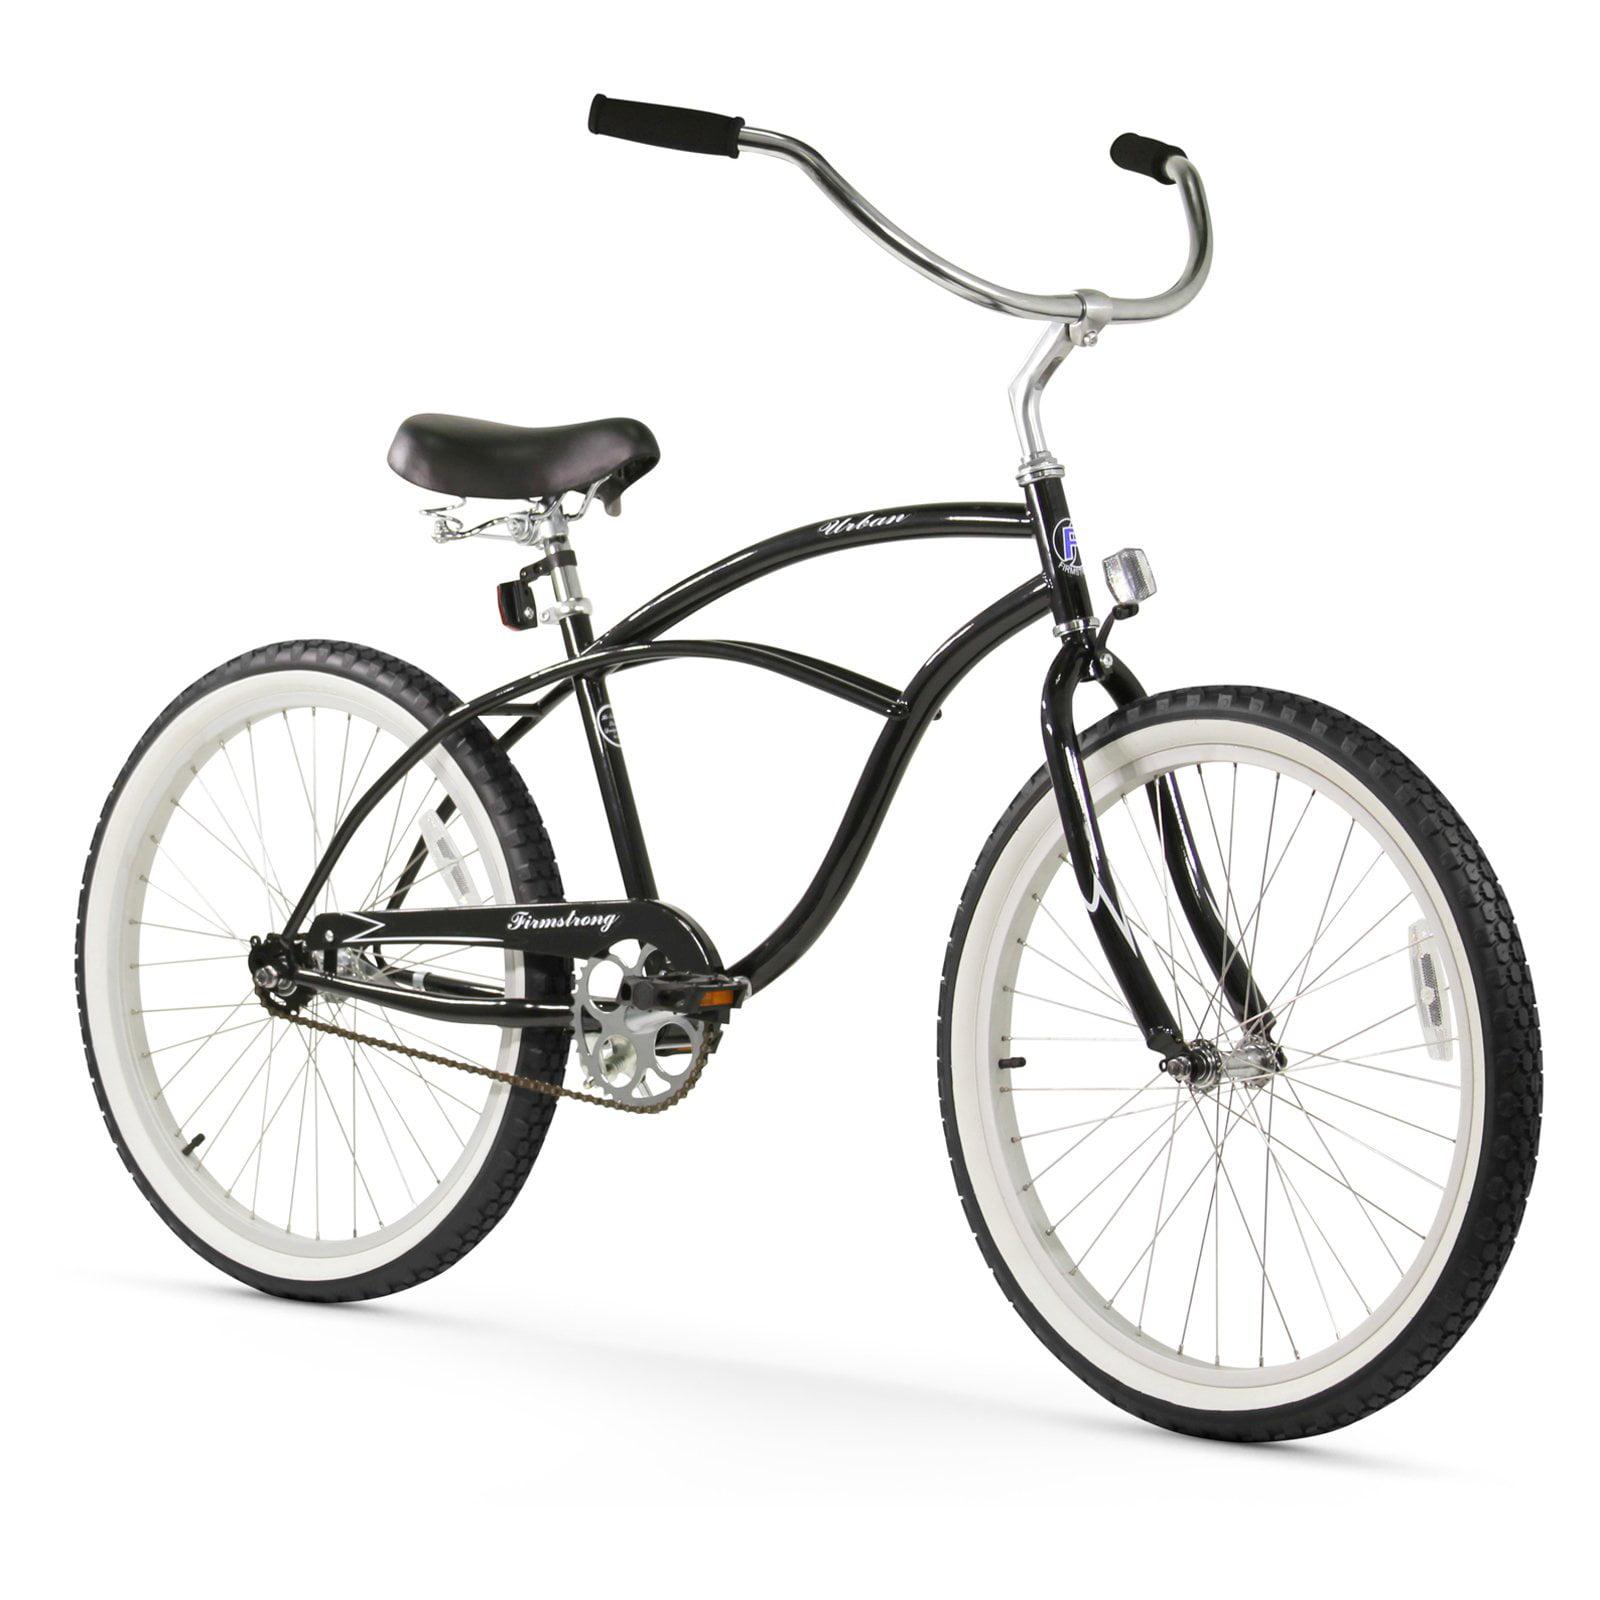 "Firmstrong 24"" Men's Urban Beach Cruiser Bicycle, 1 Speed"